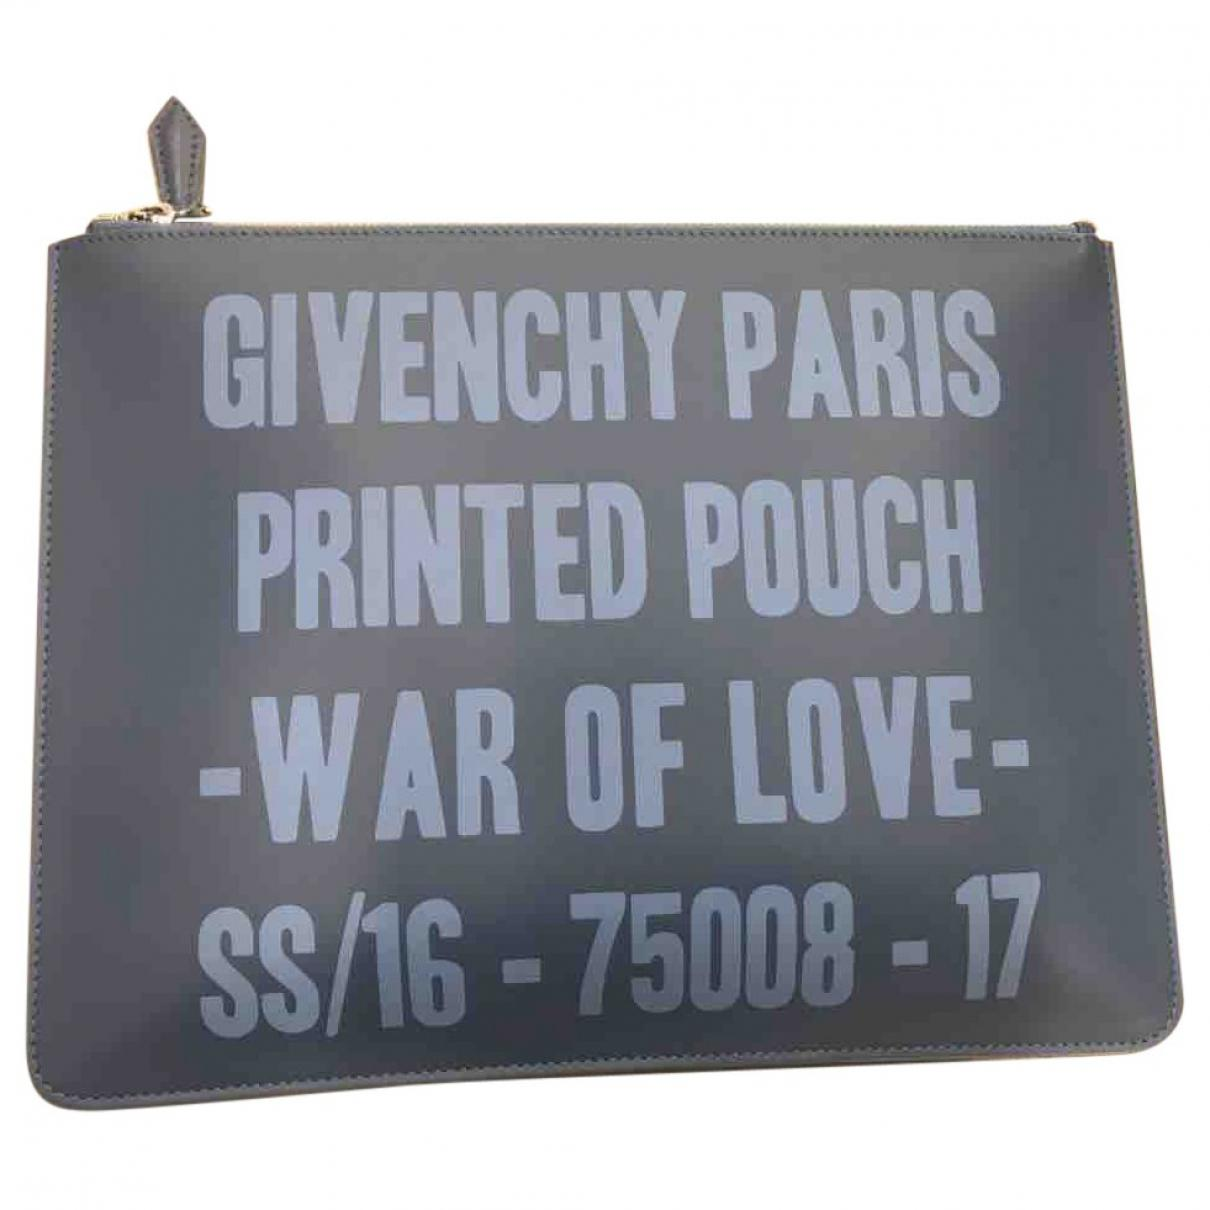 Lyst - Petite maroquinerie en cuir Givenchy en coloris Bleu 6aedd99a150